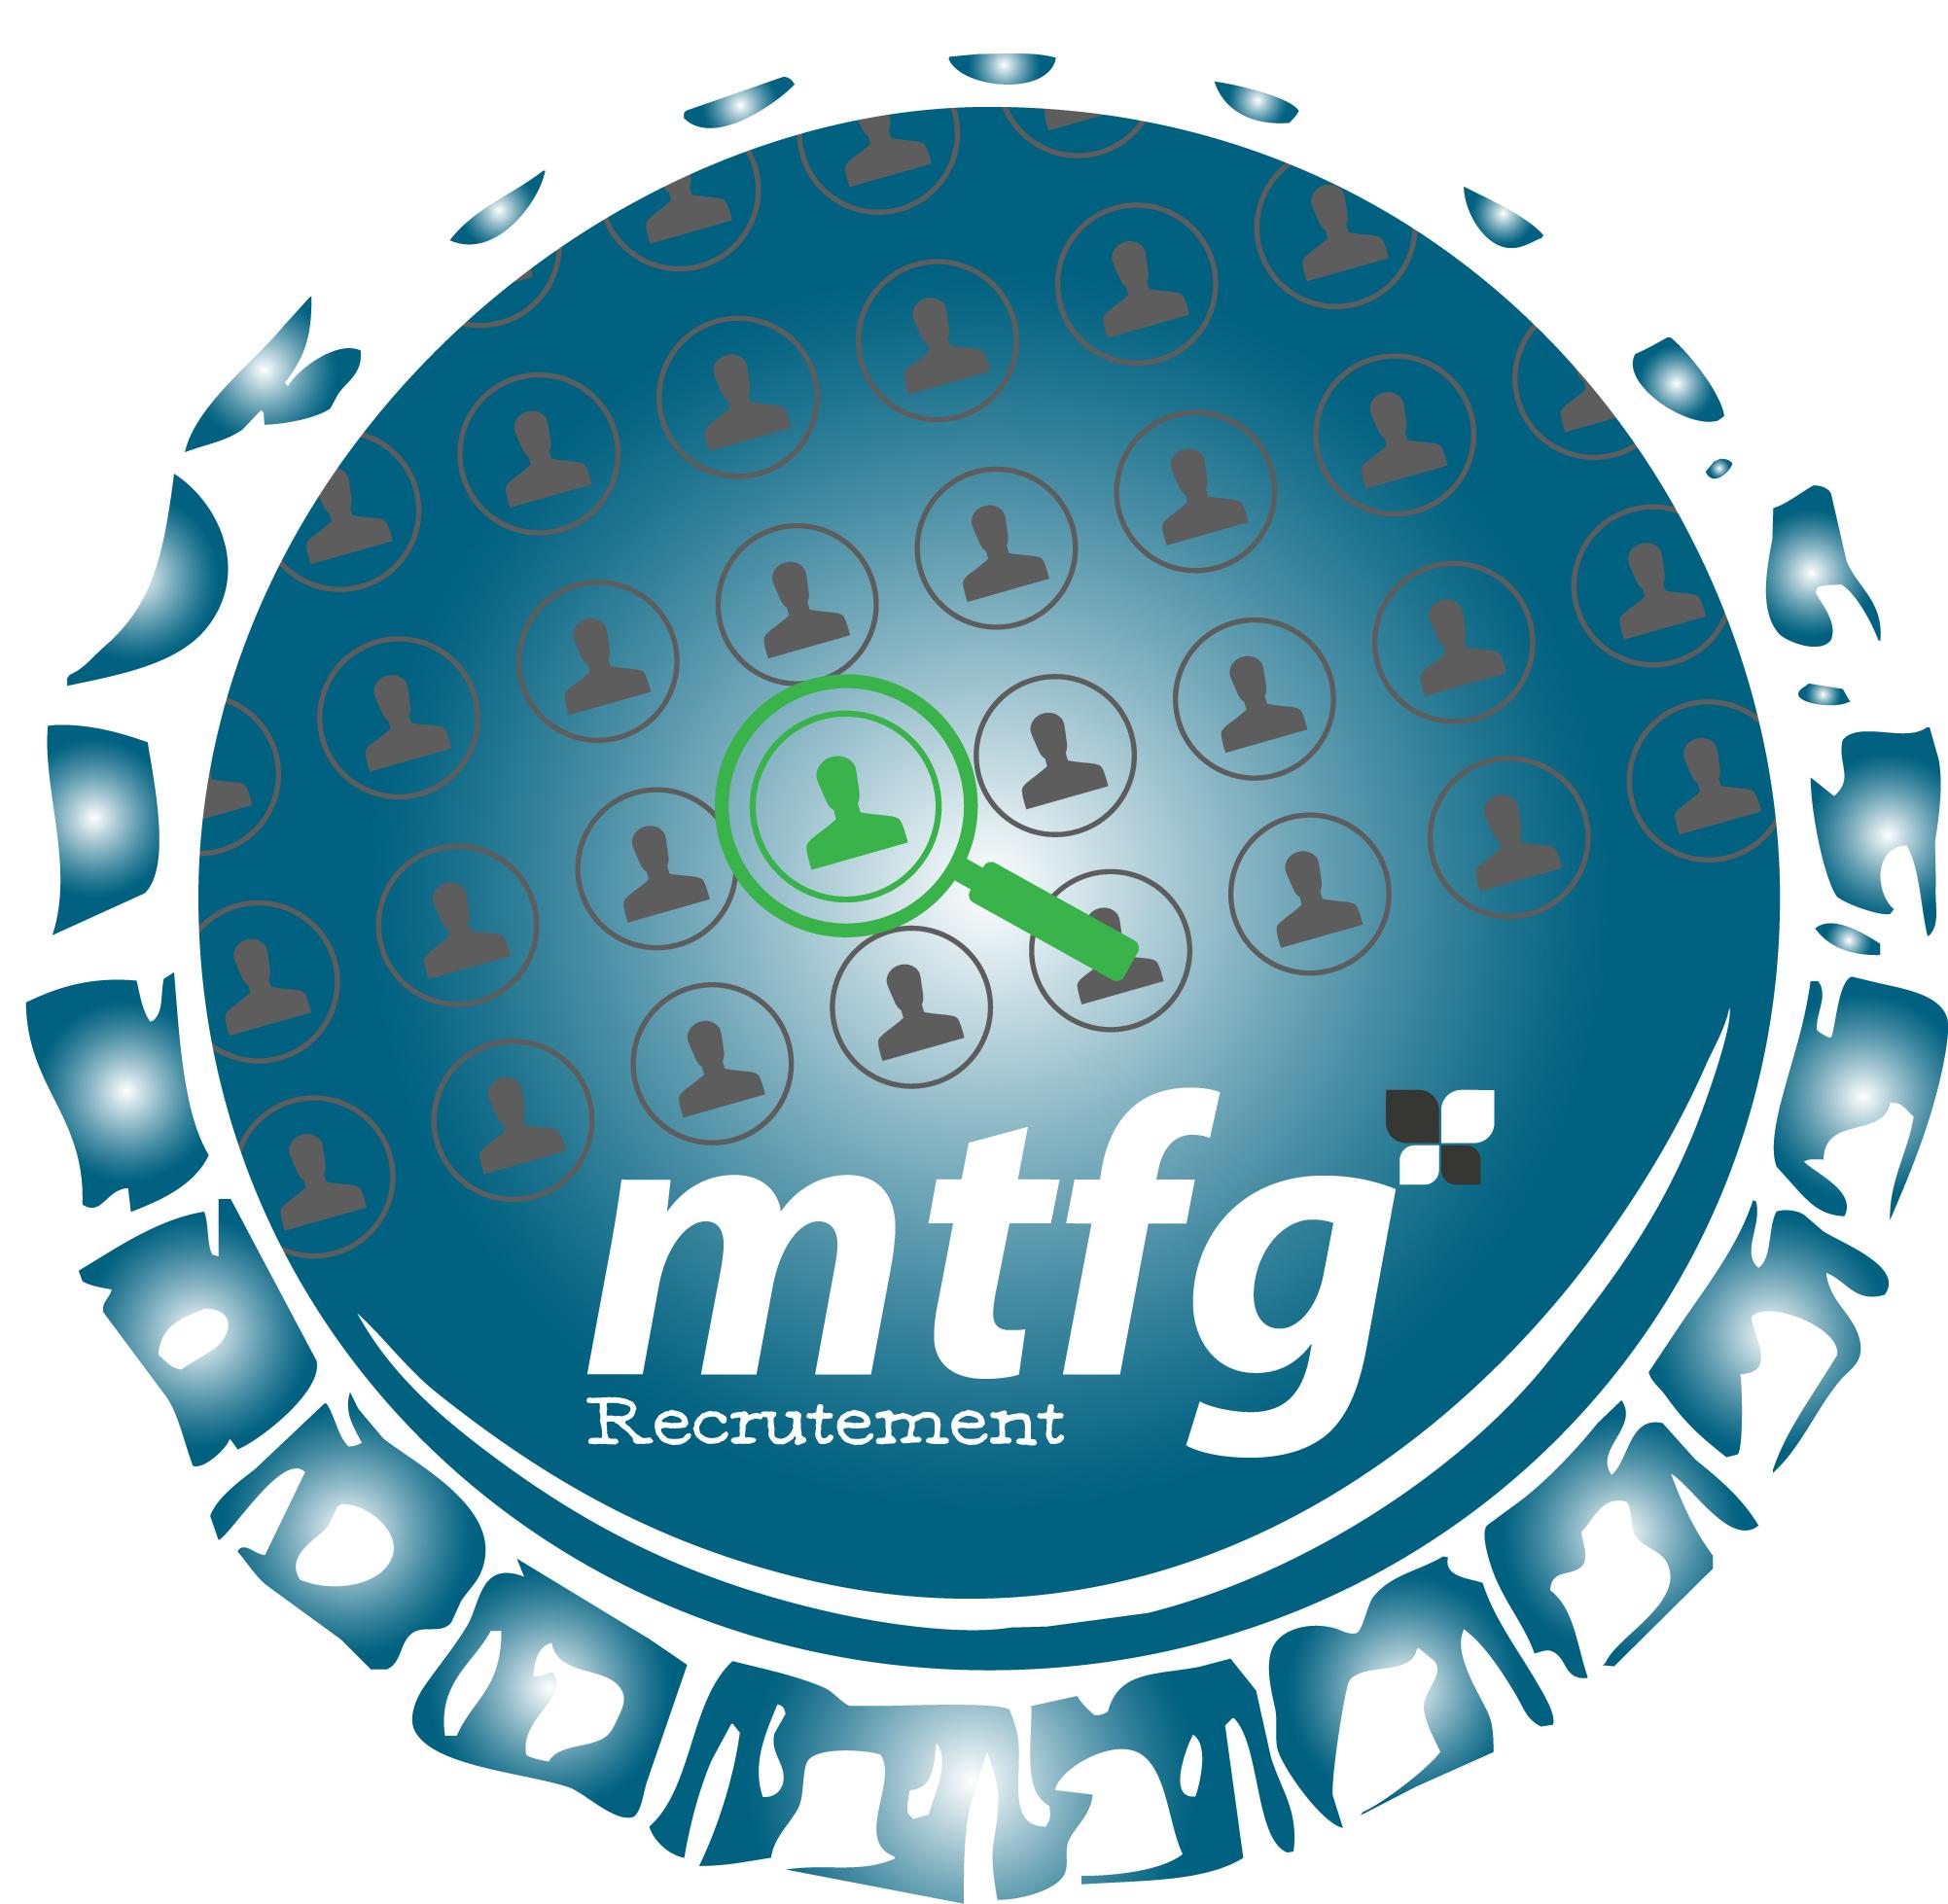 MTFG Recrutement